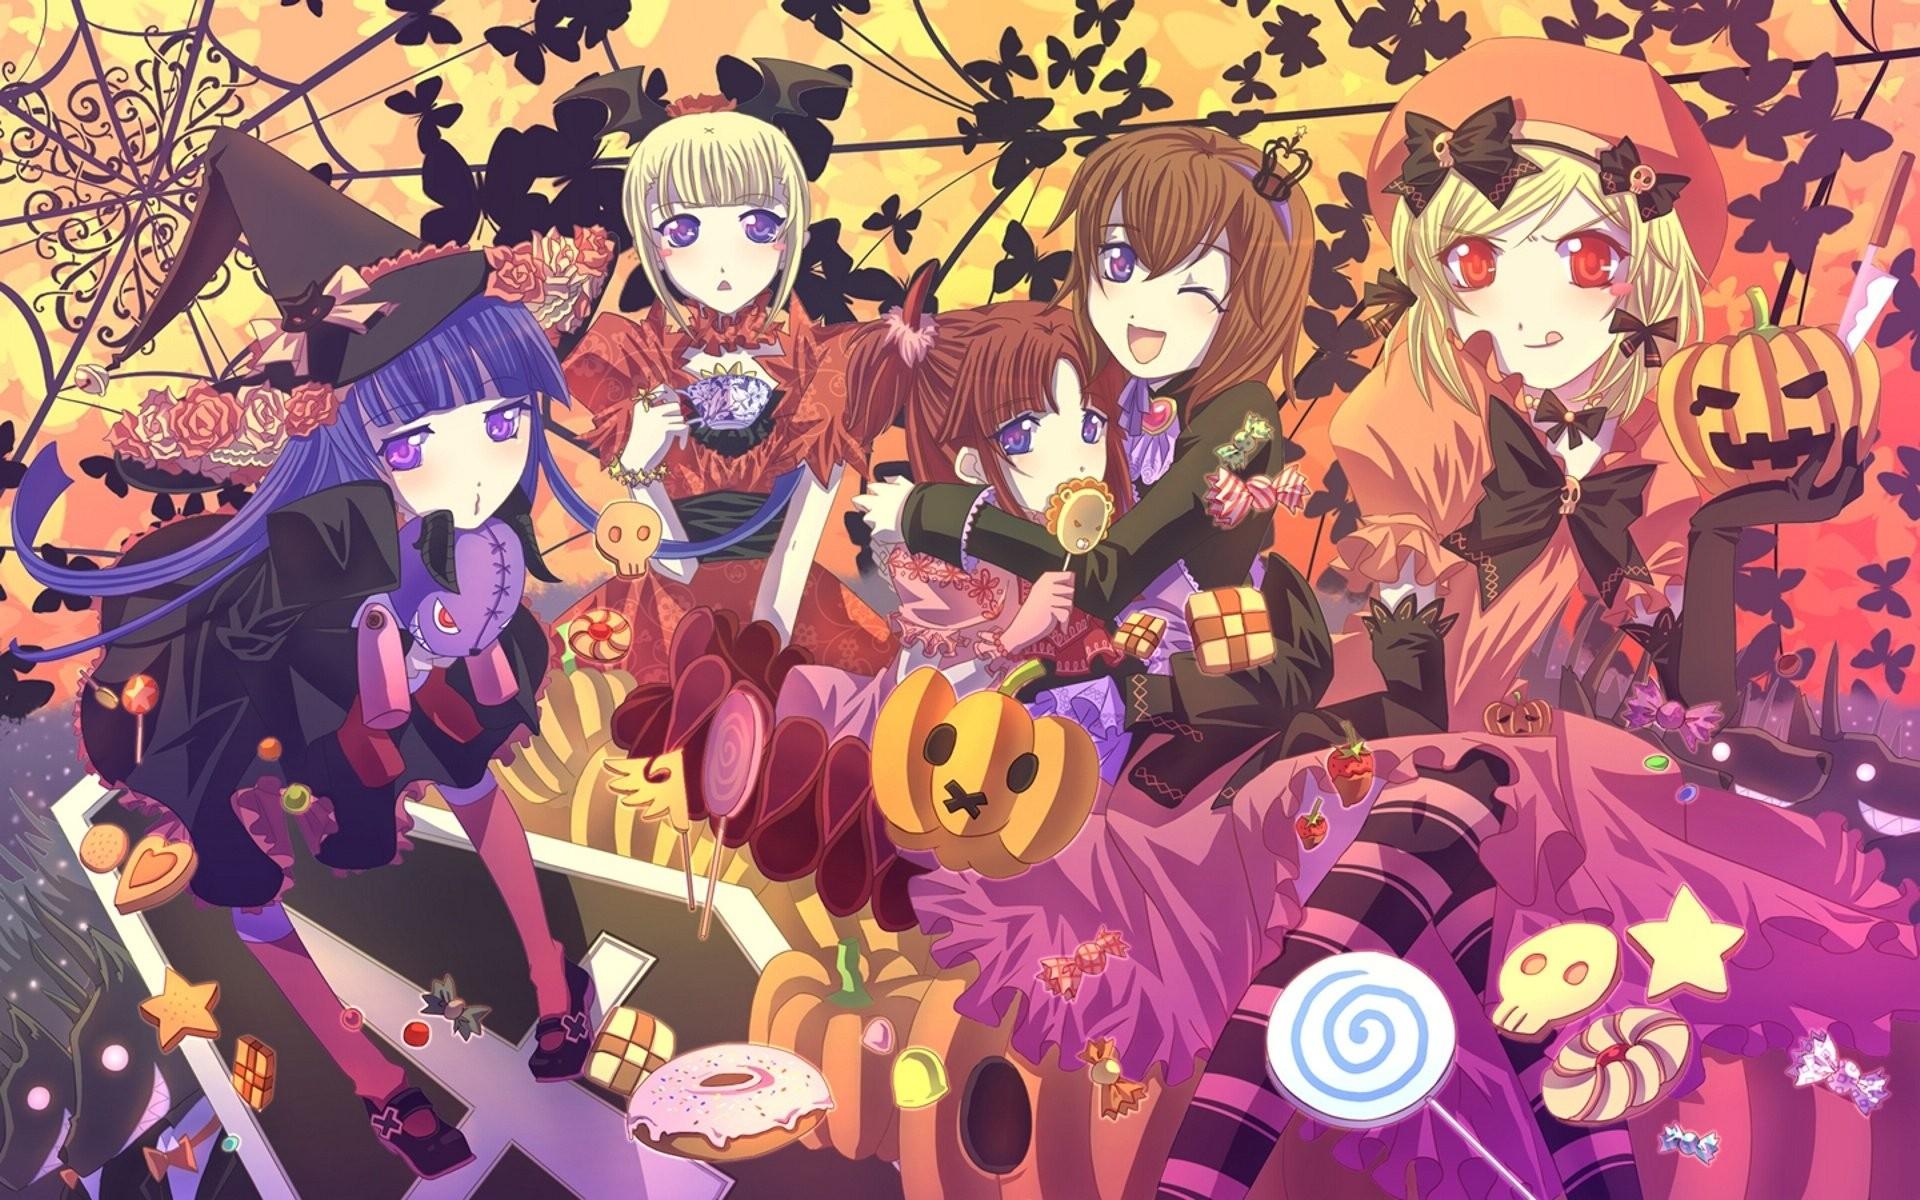 Neko Girl Live Wallpaper Anime Halloween Wallpaper 54 Images